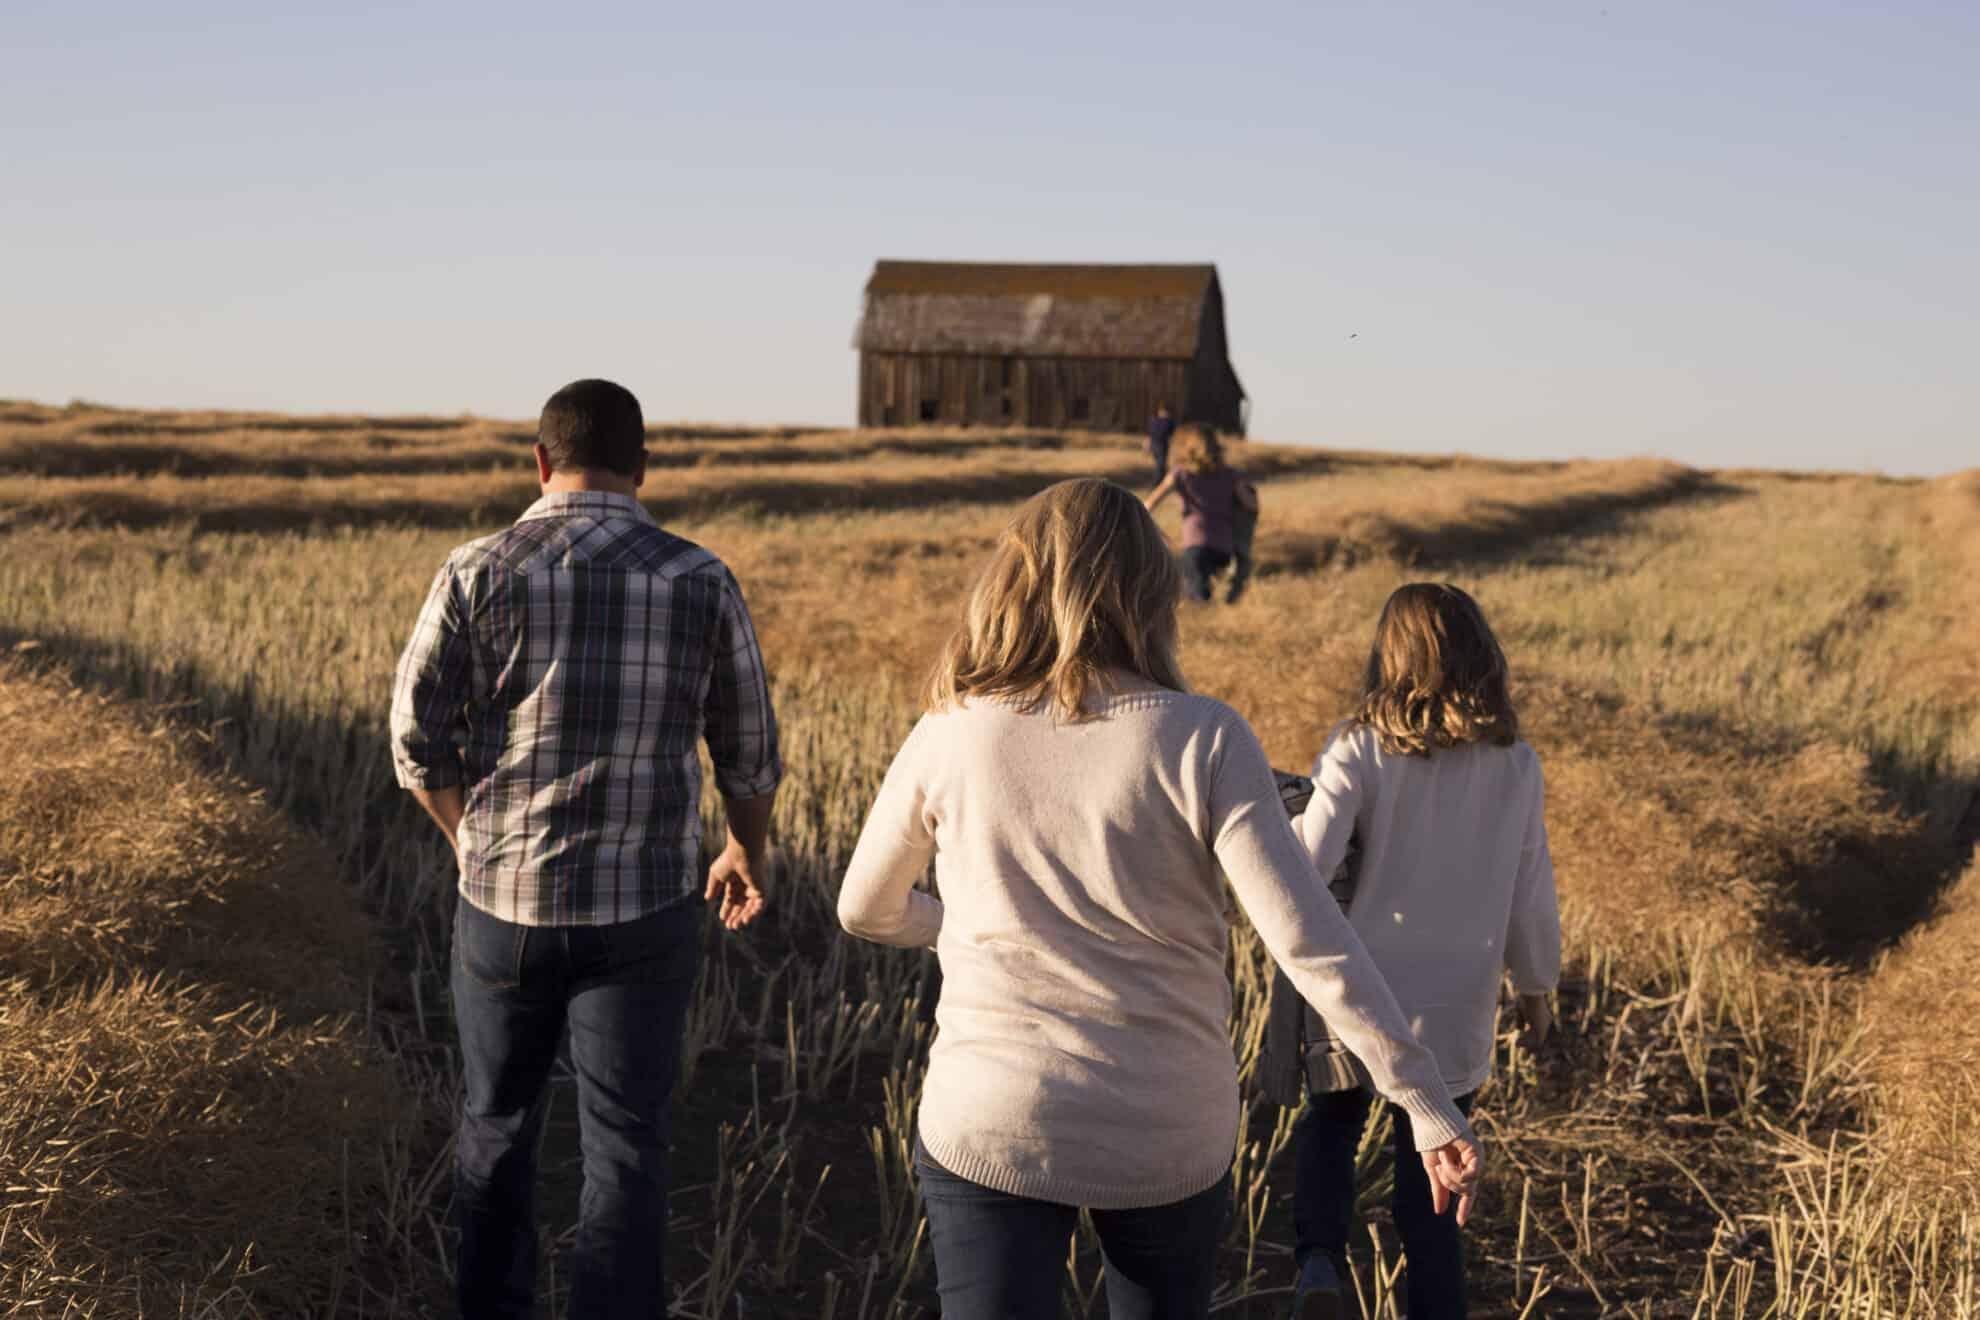 family scavenger hunt staycation ideas for kids